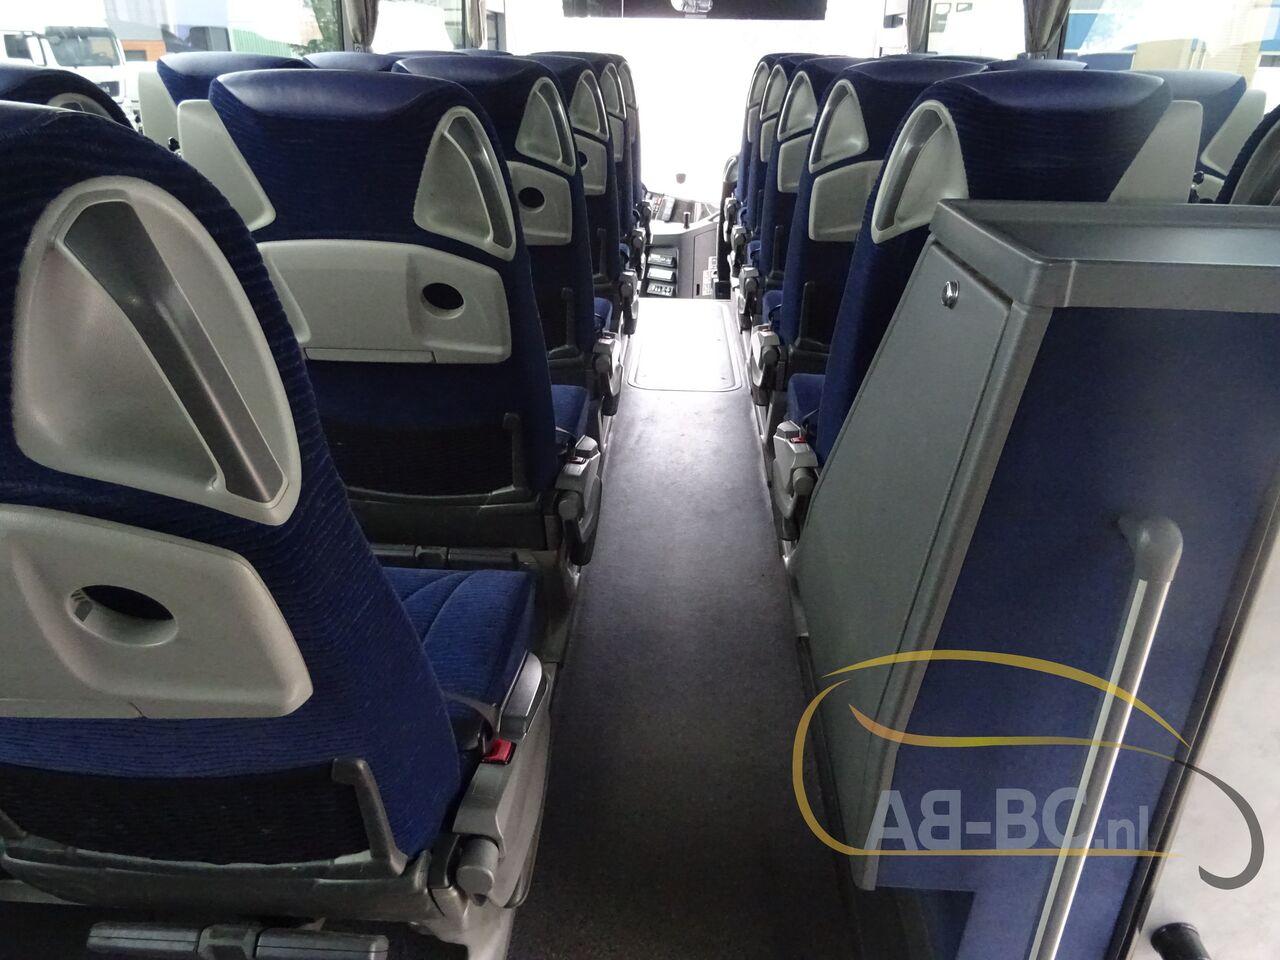 coach-busSETRA-S415-GT-HD-FINAL-EDITION---1627457318039991985_big_daa8eb3b8bfc329270cb62ded1fd3d37--21050713010665719300